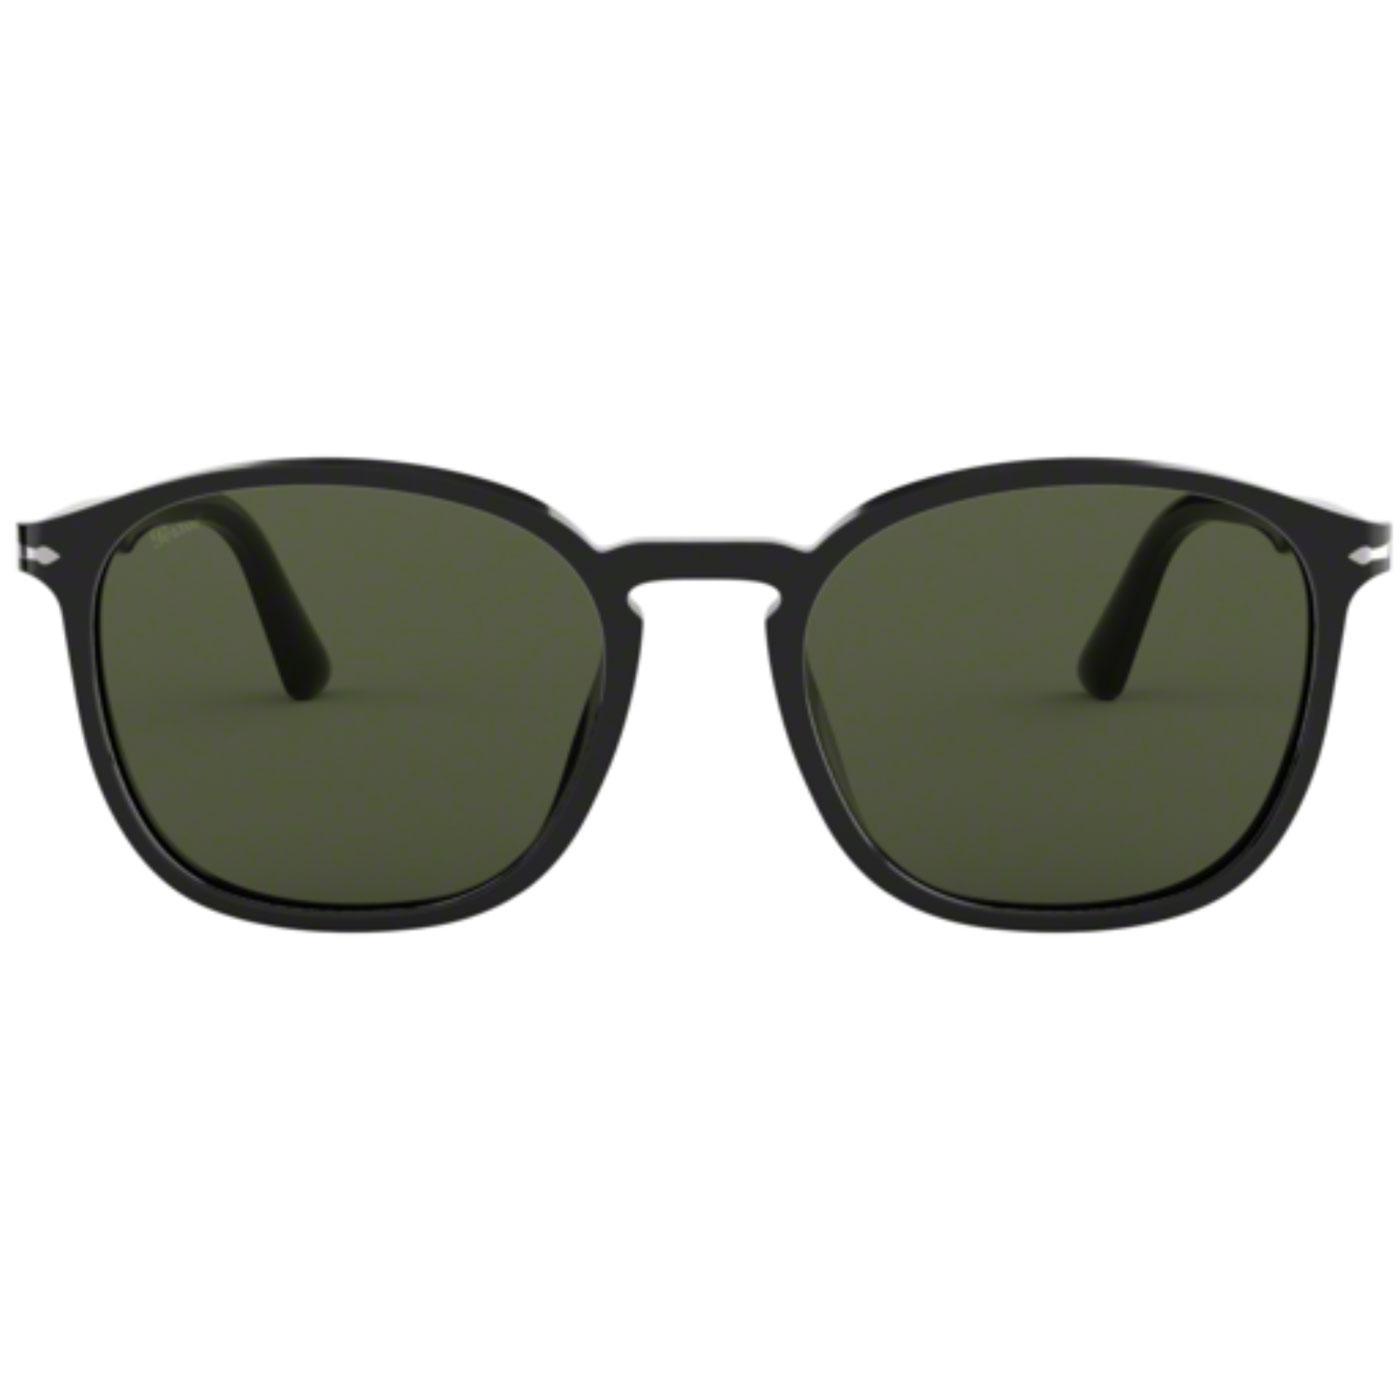 PERSOL Men's Retro 70s Wayfarer Sunglasses (Black)